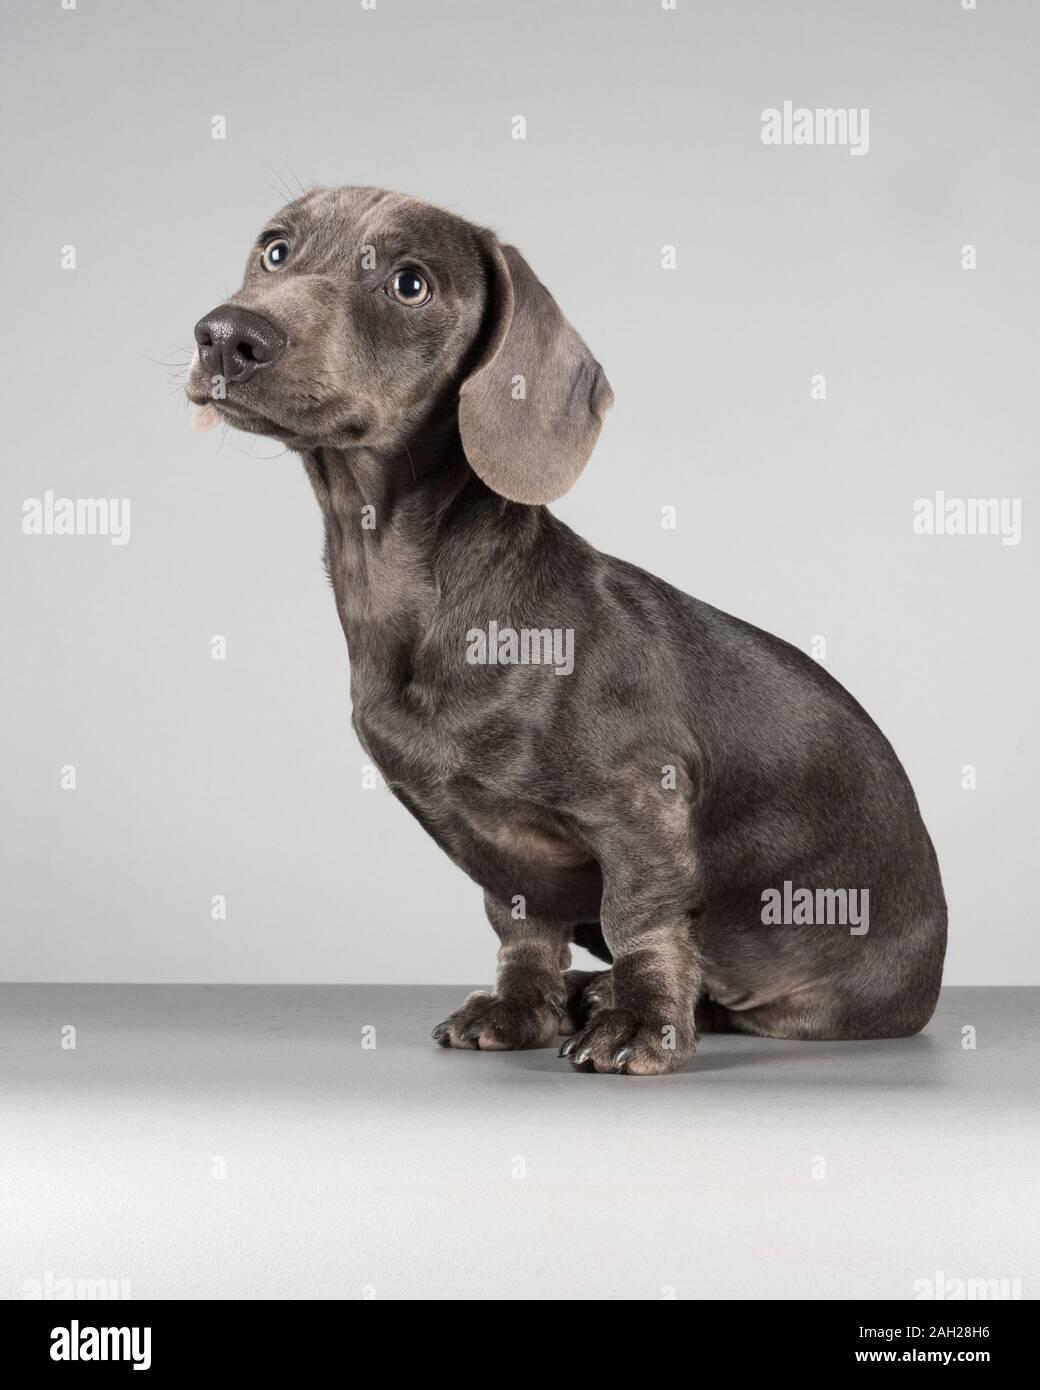 4 Month Old Blue Miniature Dachshund Puppy Male Uk Stock Photo Alamy